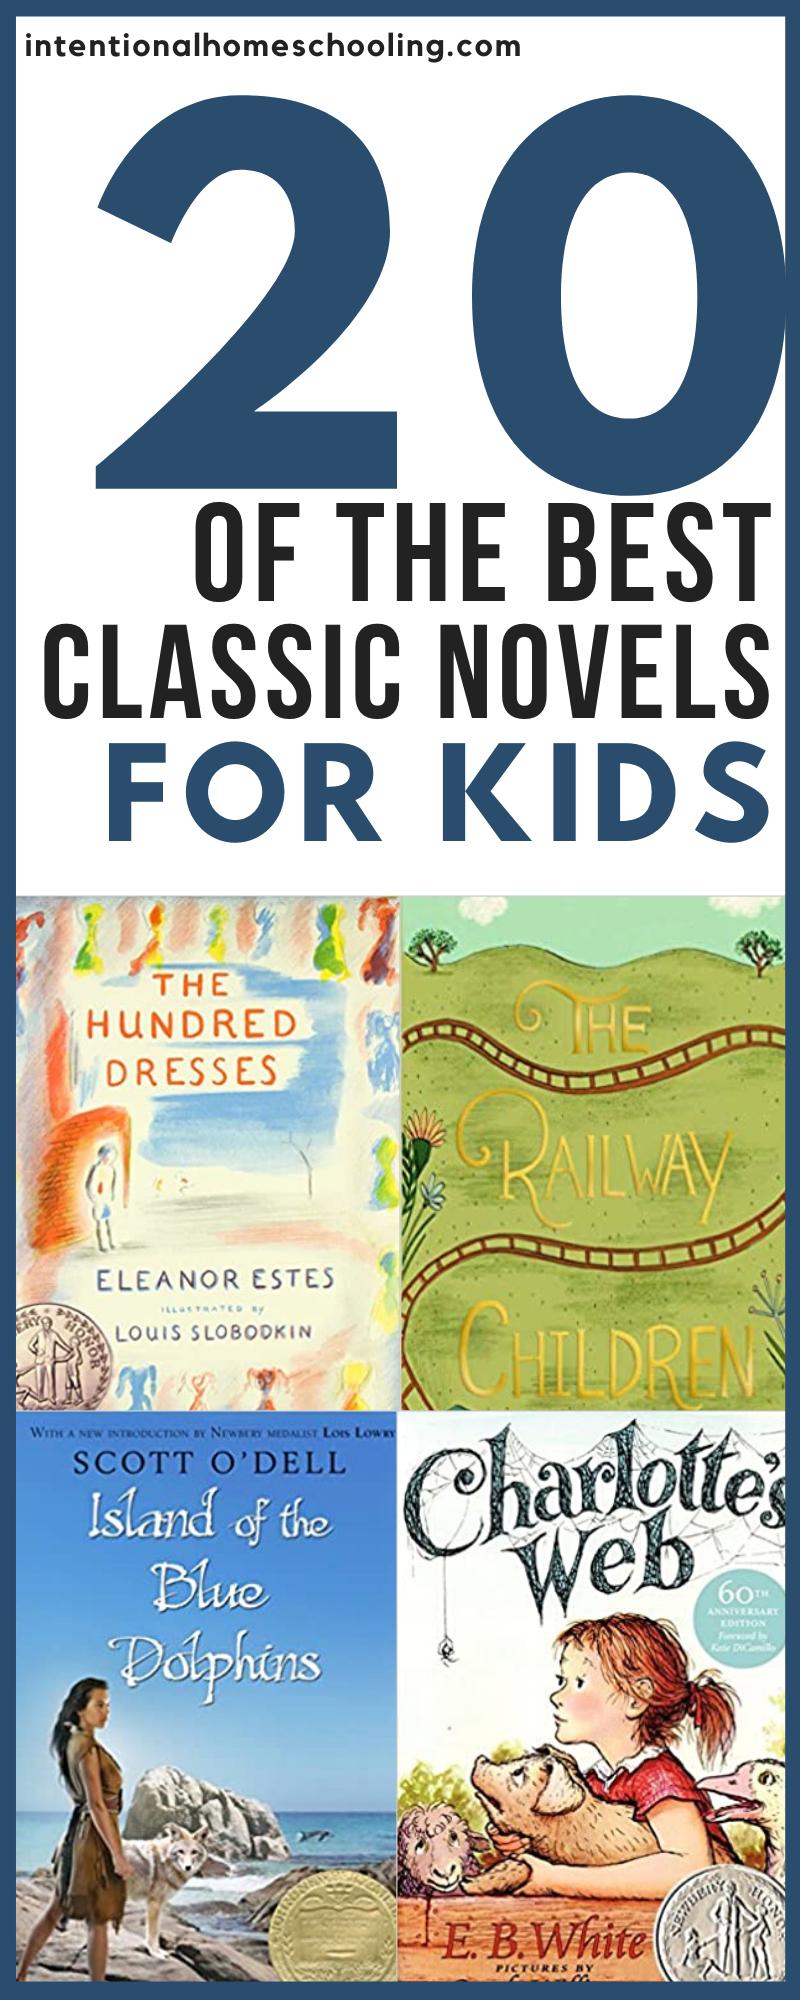 Classic Novels for Elementary Kids - great classics for kindergarten, grade 1, grade 2, grade 3, grade 4 and pre-kindergarten!